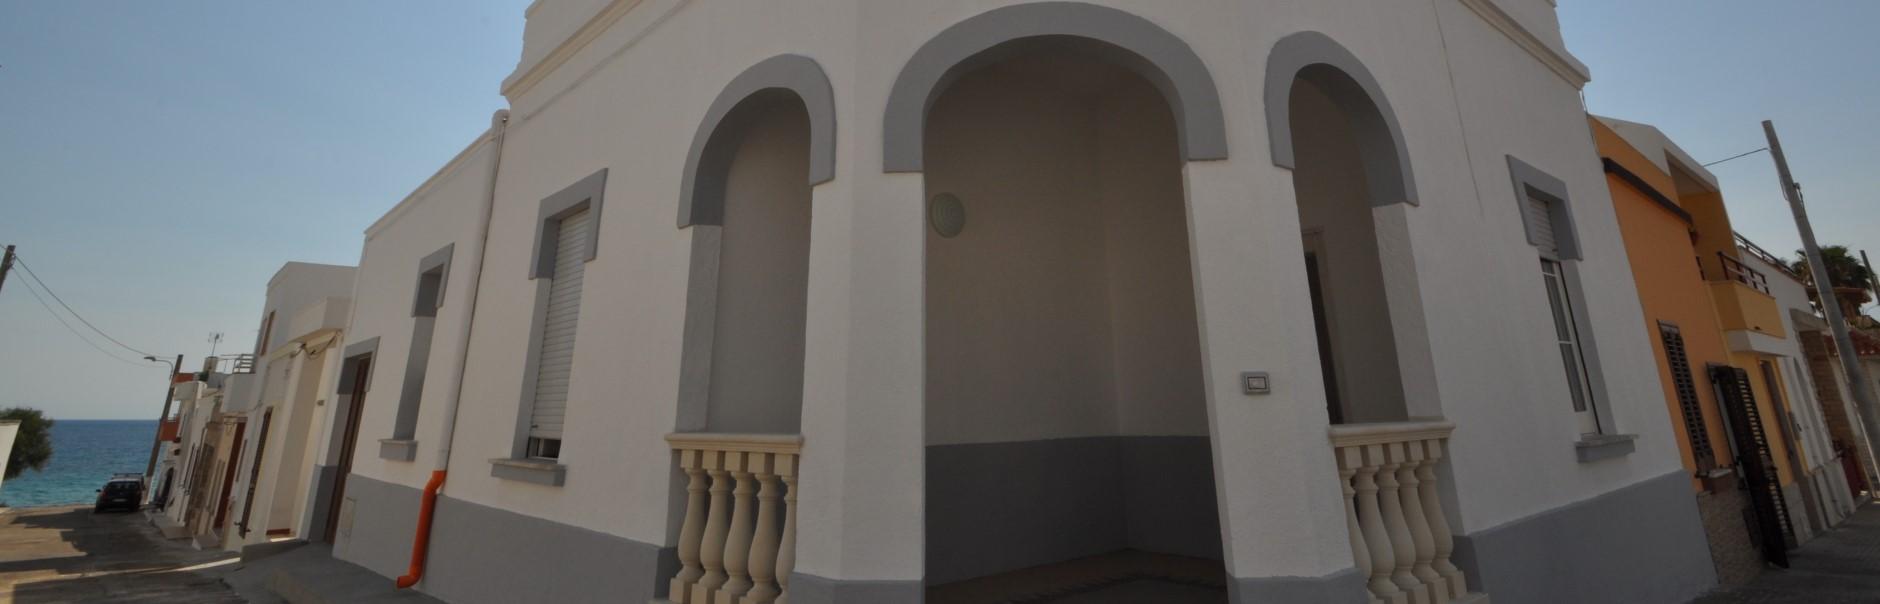 Villetta Capri - Mancaversa